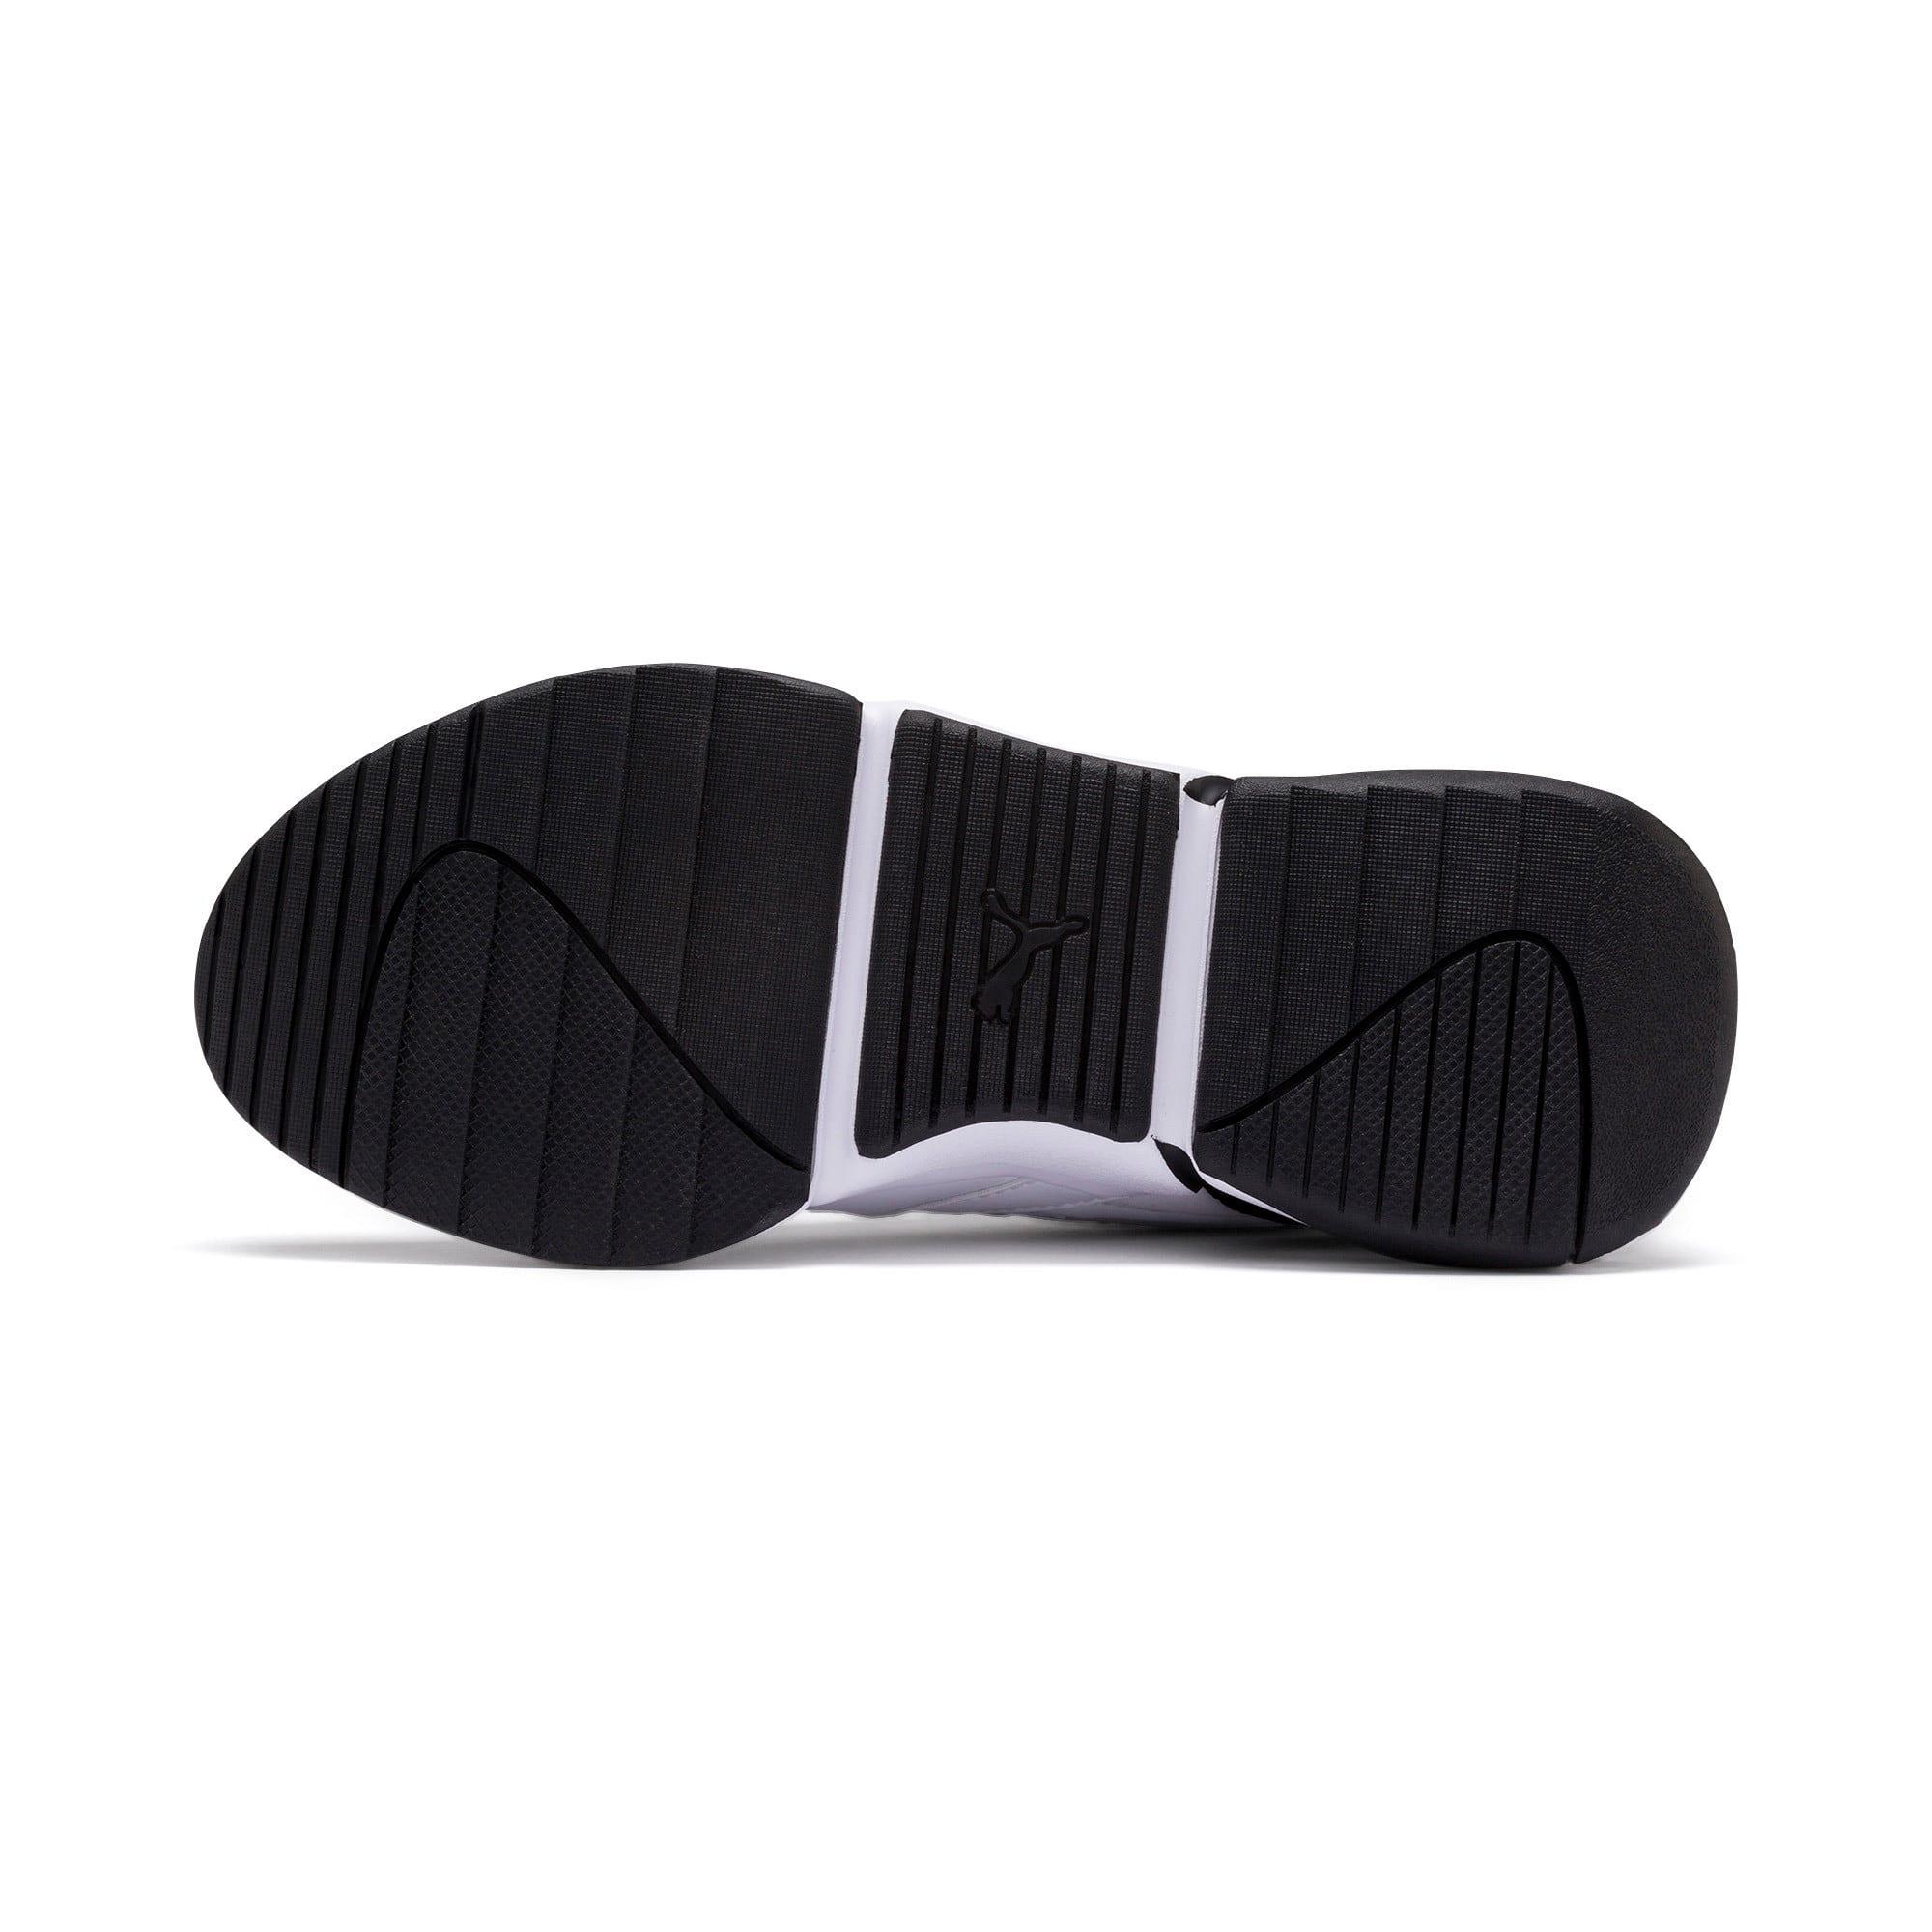 Thumbnail 5 of Nova Women's Sneakers, Puma White-Puma Black, medium